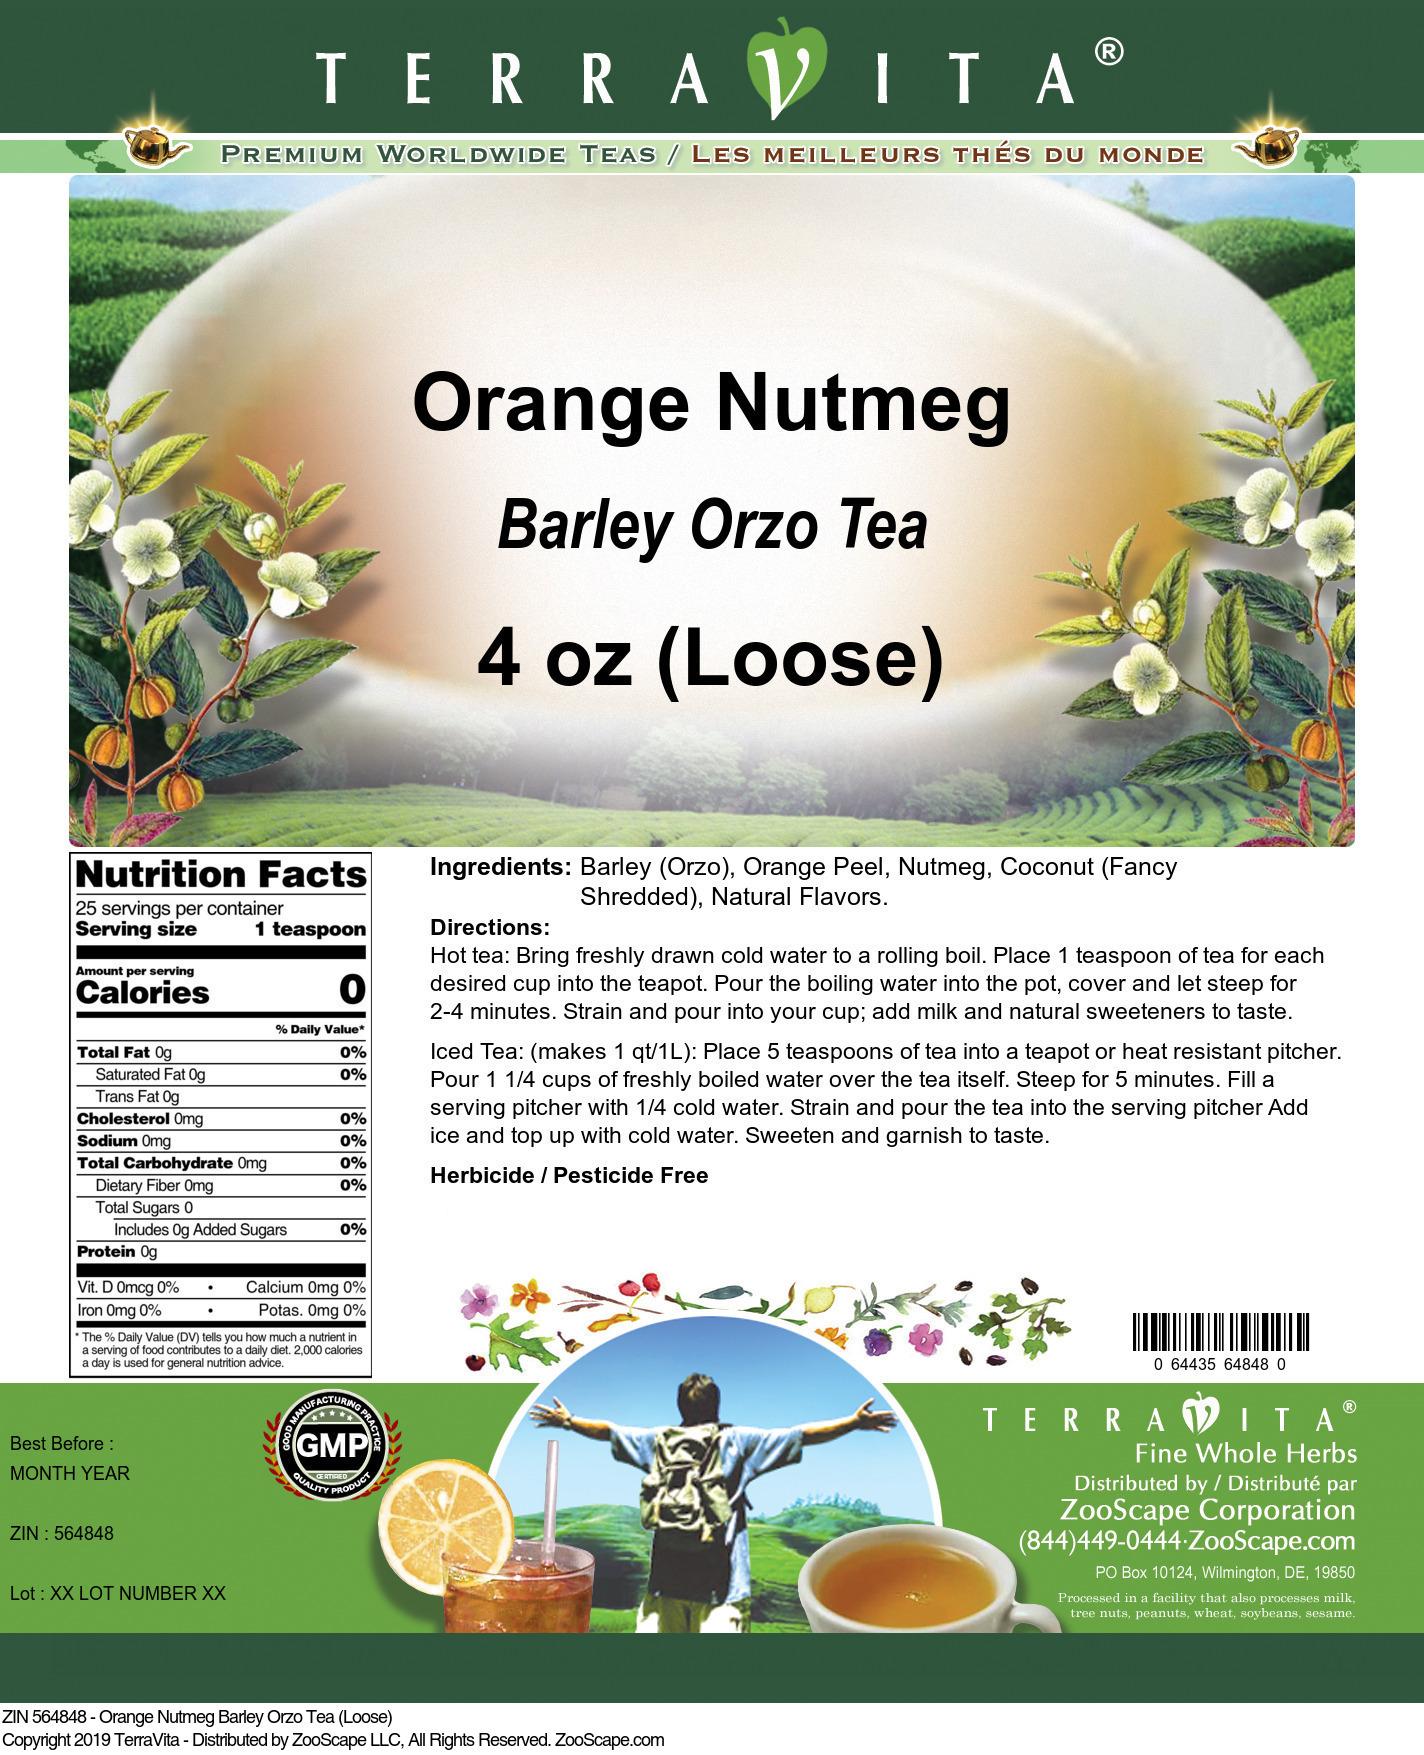 Orange Nutmeg Barley Orzo Tea (Loose)